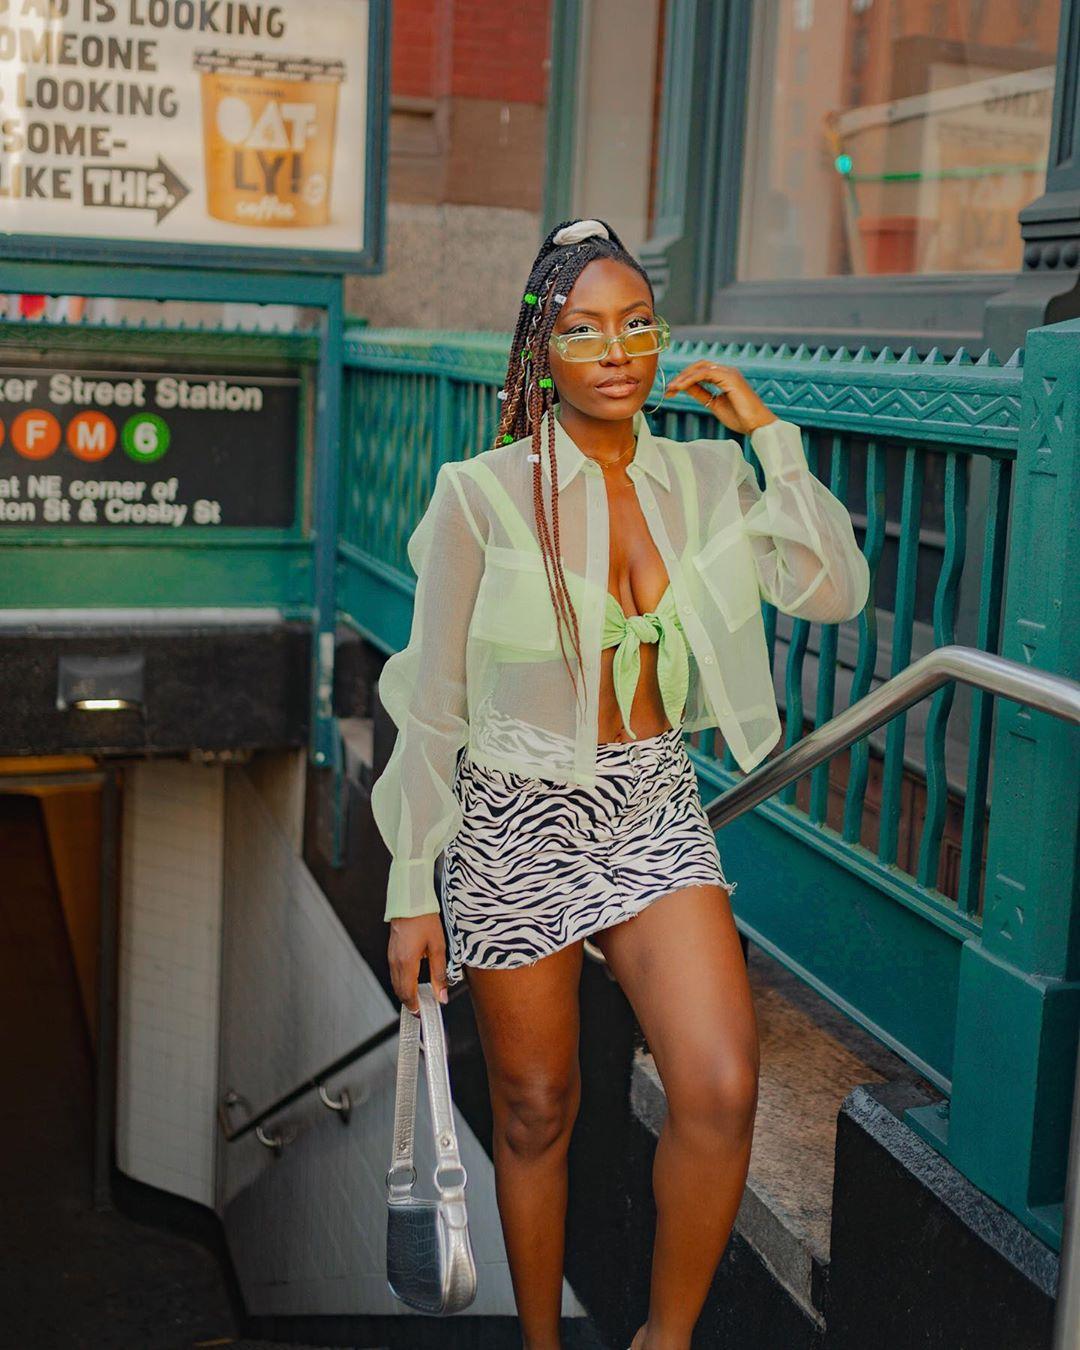 Nkenge usando óculos verdes